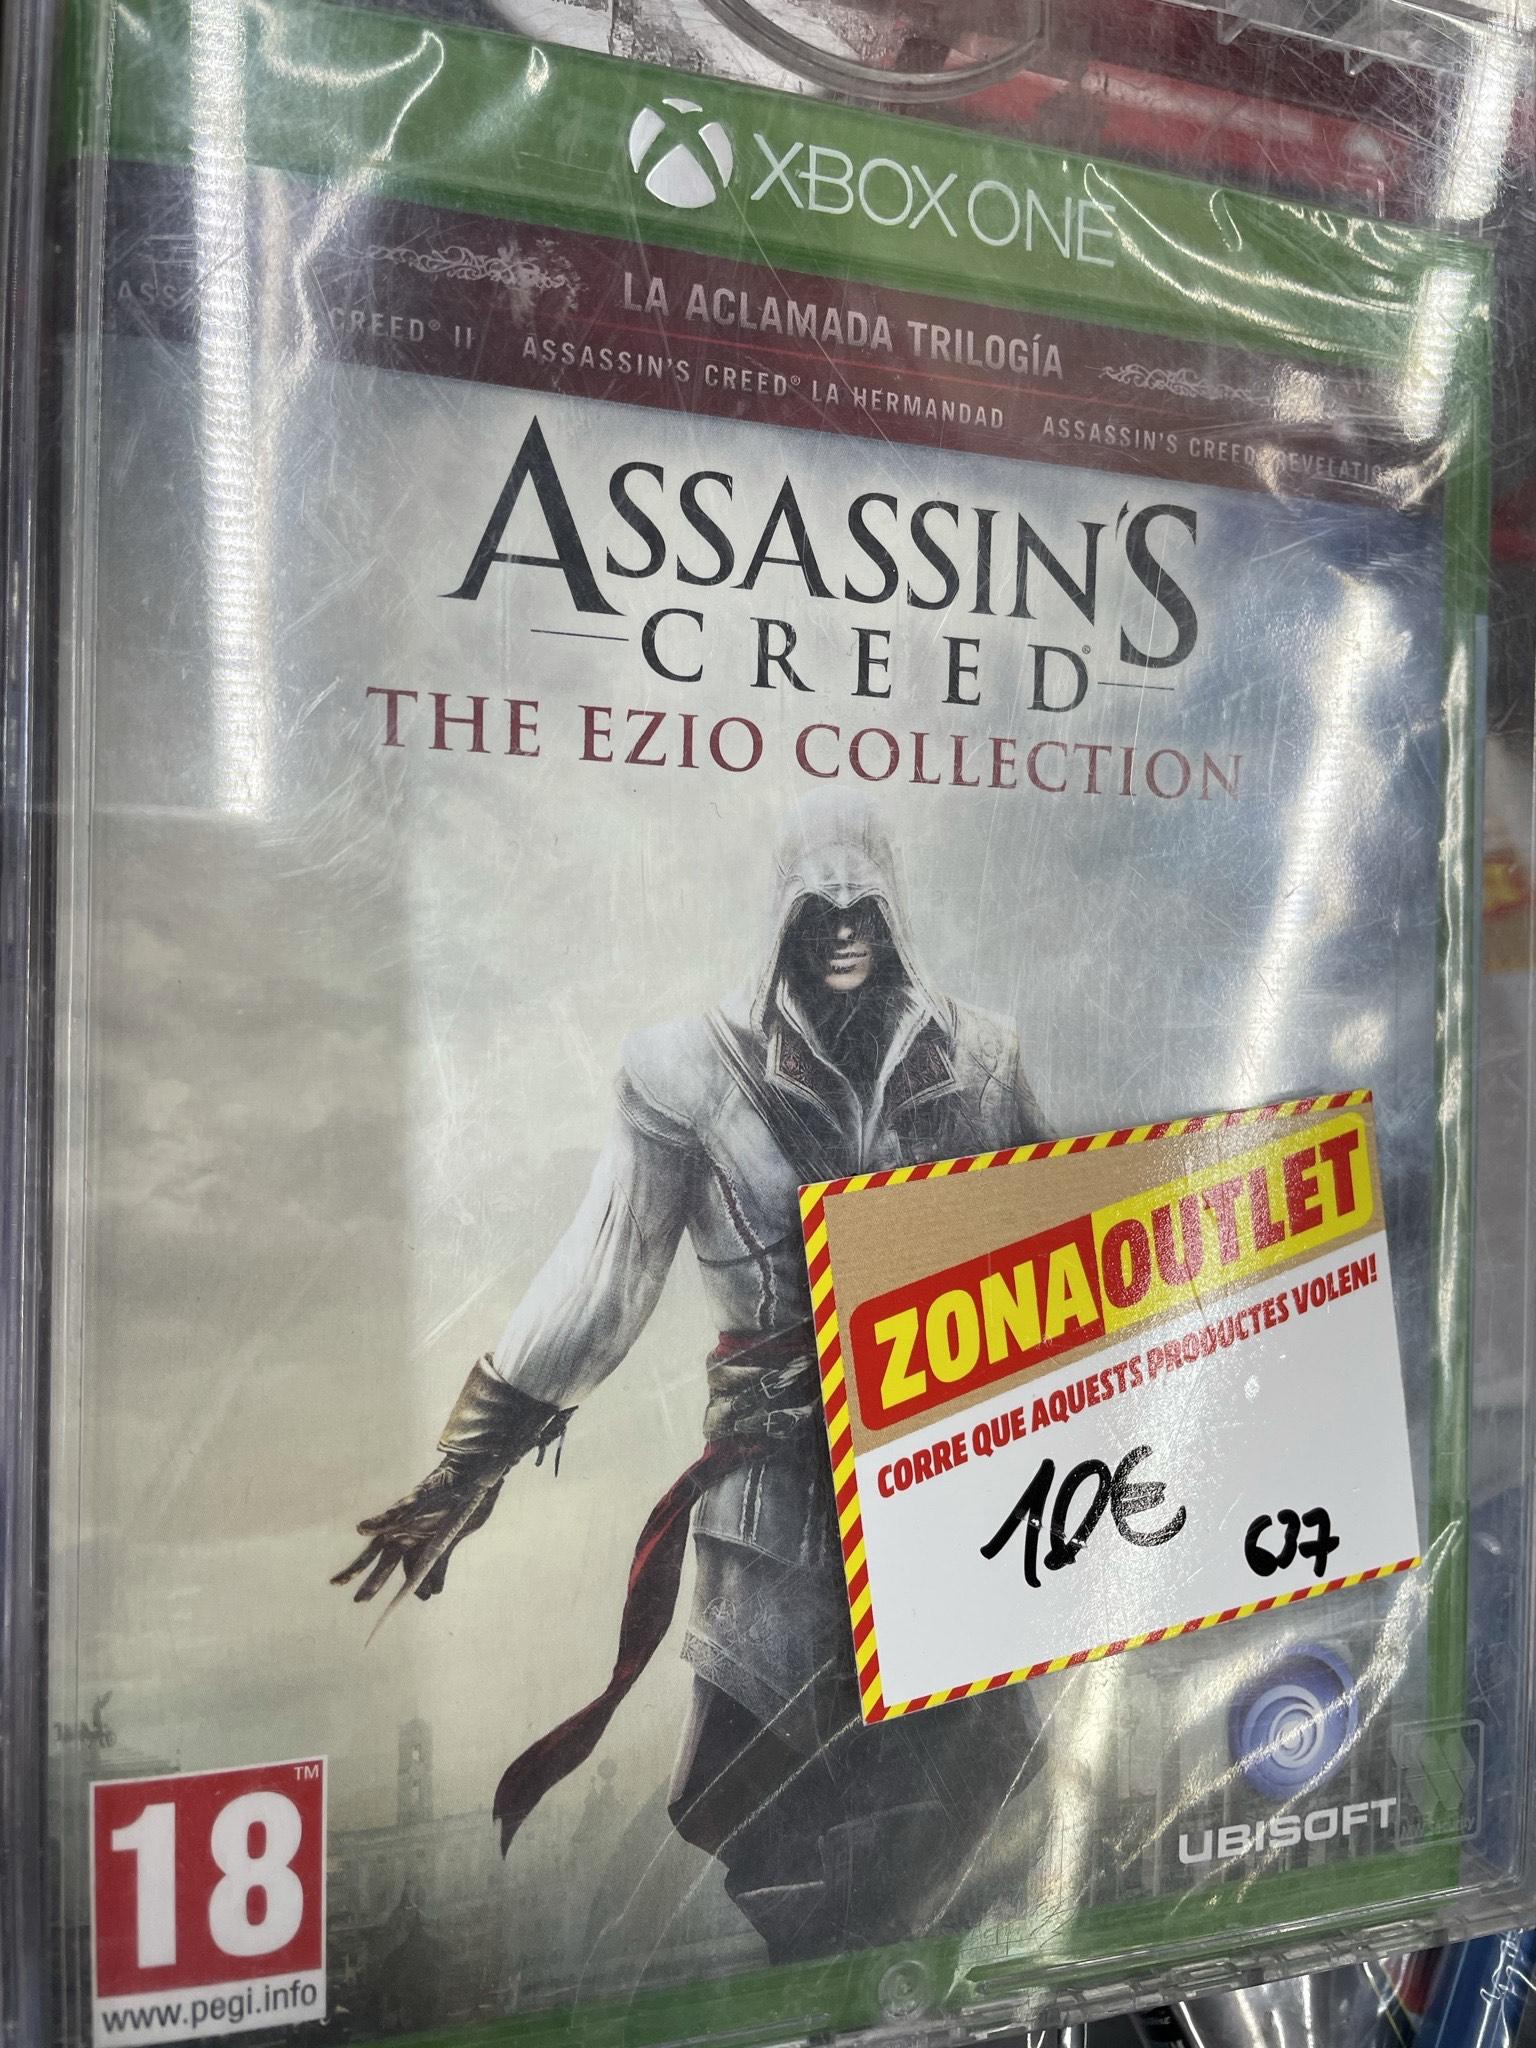 Assassins creed Xbox - Media Market Parc Vallès